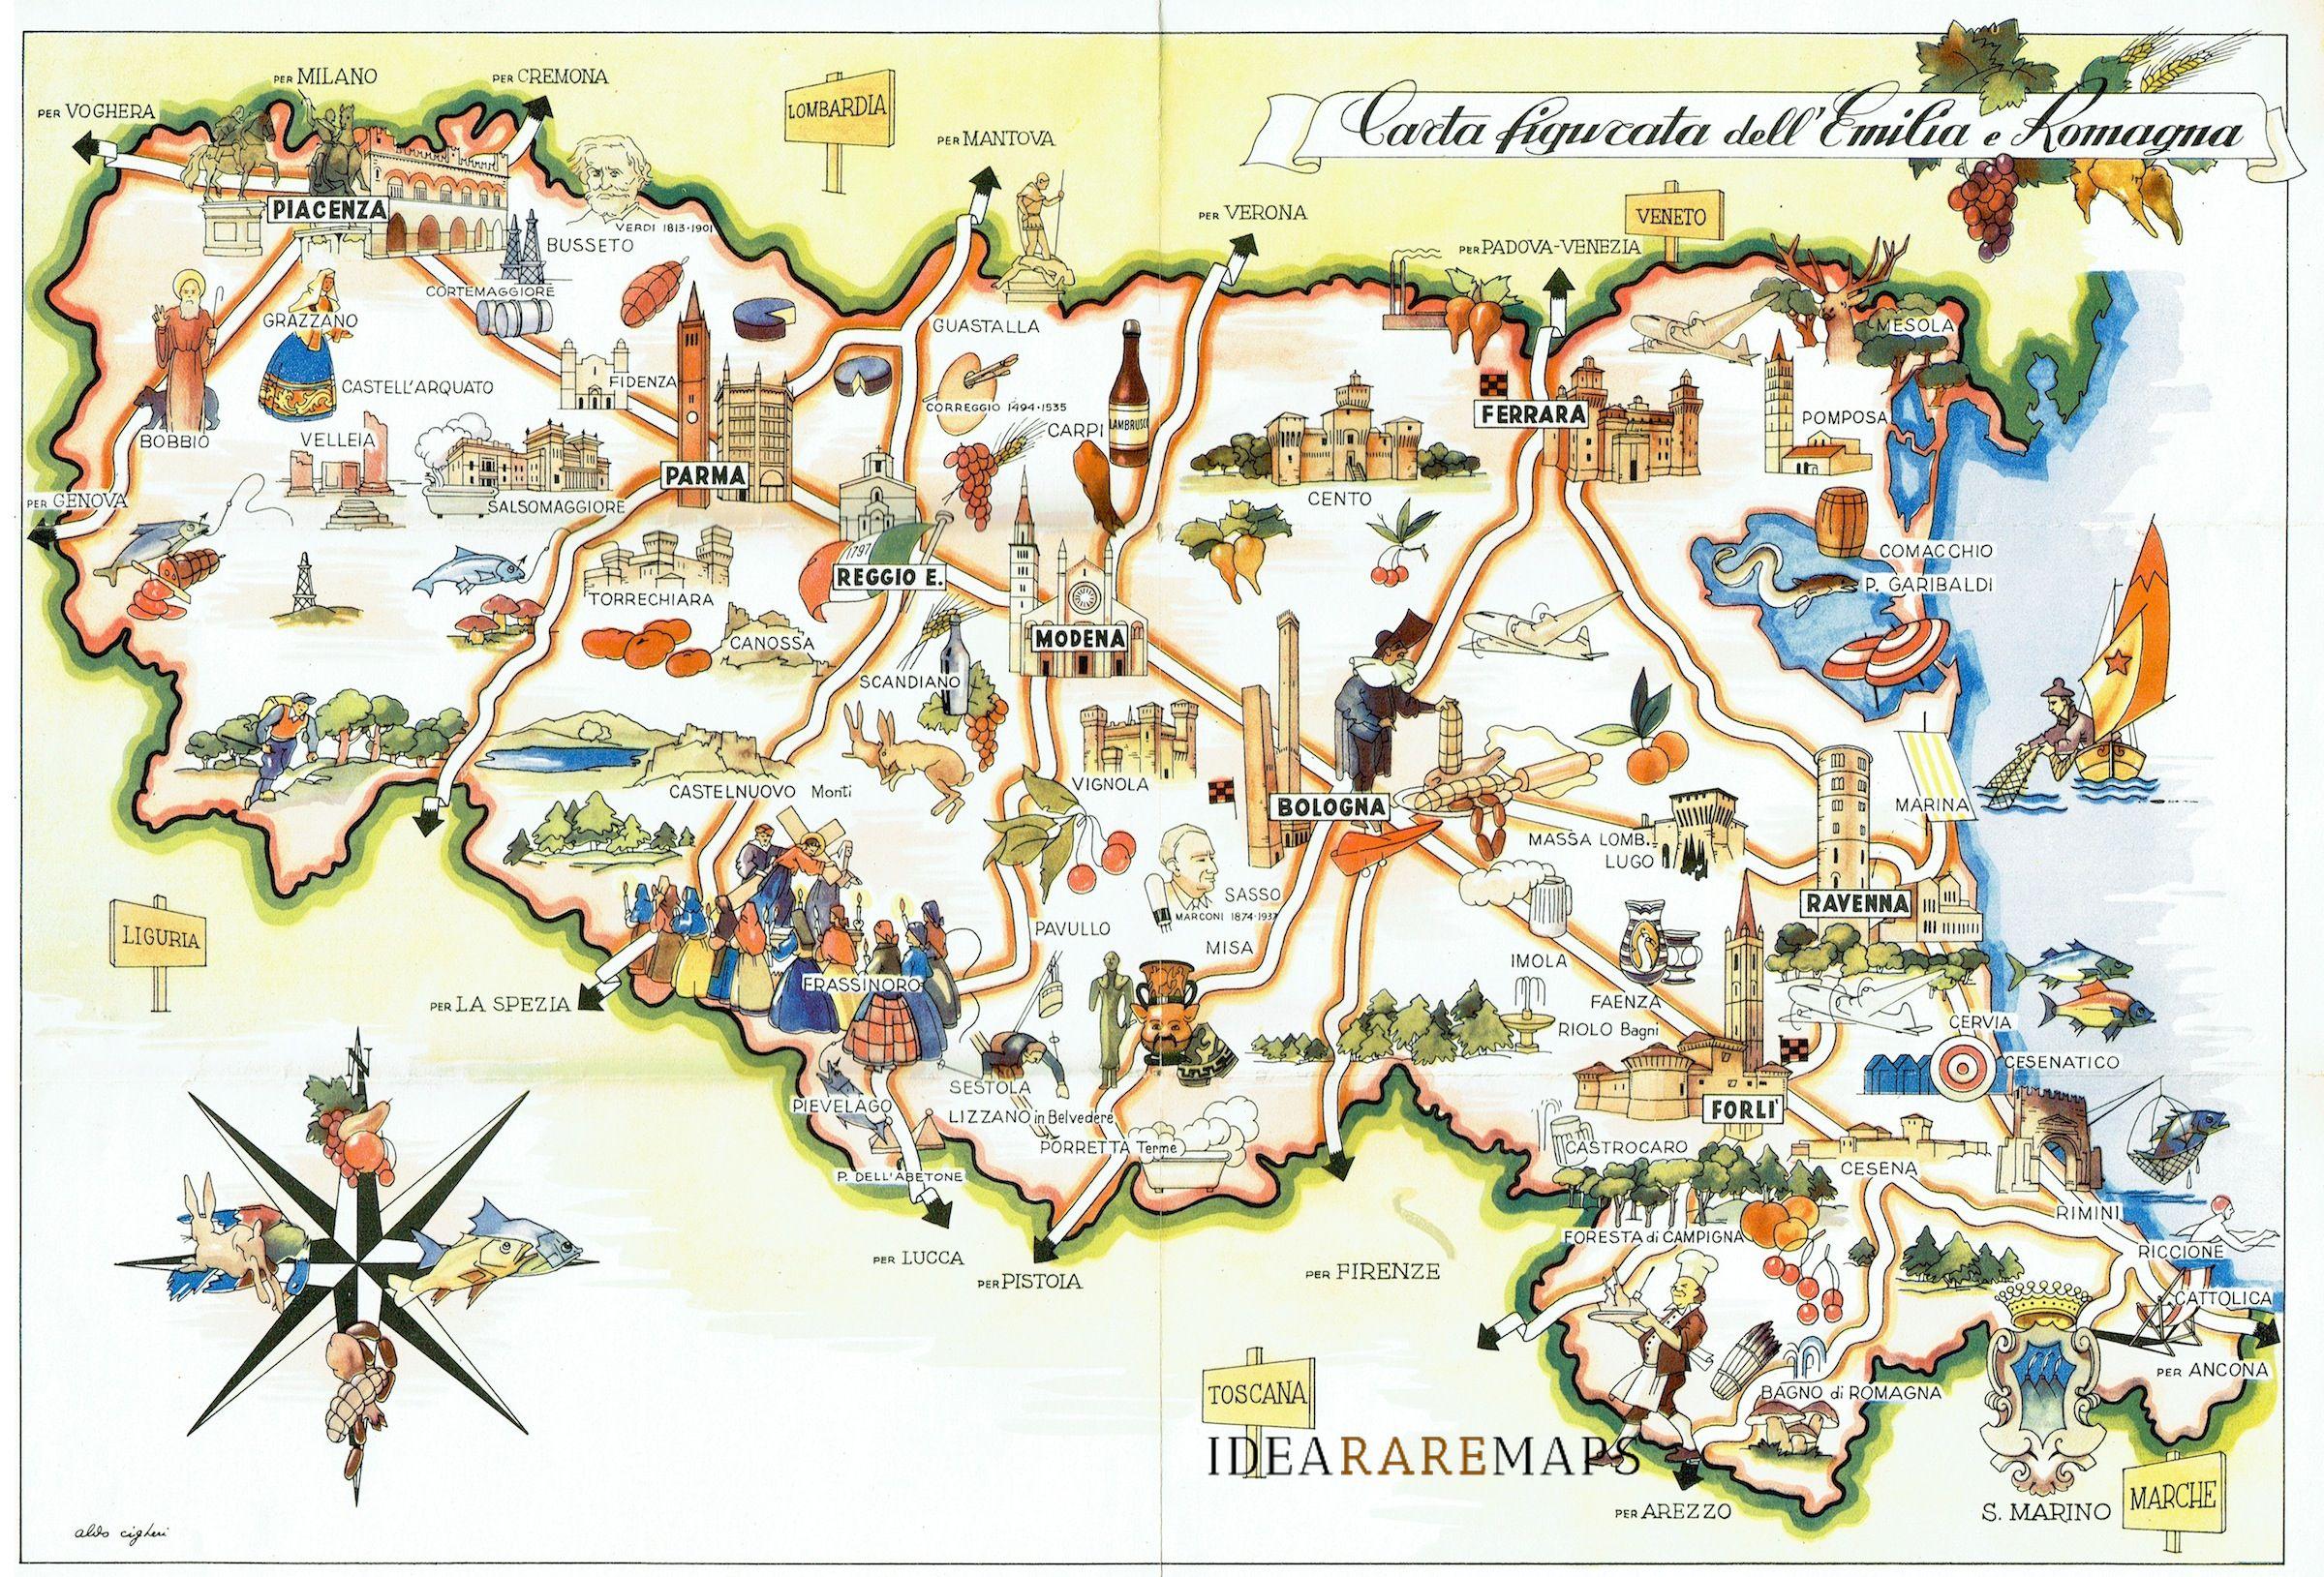 Emilia Romagna Cartina Dettagliata.Emilia Romagna Cartina Bicimtbebike Com Listini Prezzi Test Bici Elettriche Gare Ciclismo